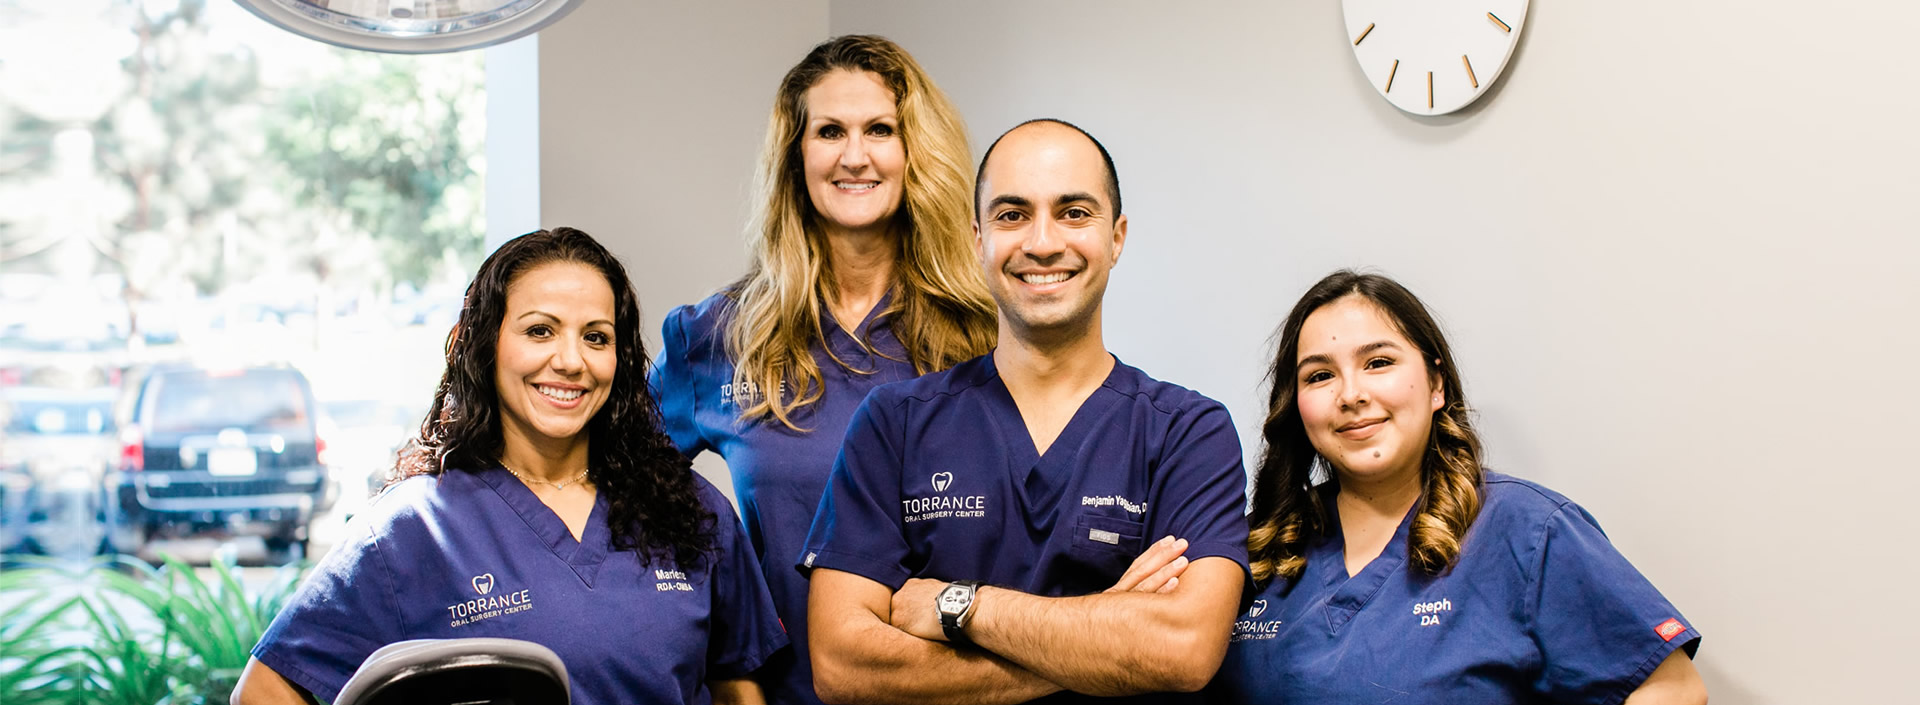 Torrance Oral Surgery Center team